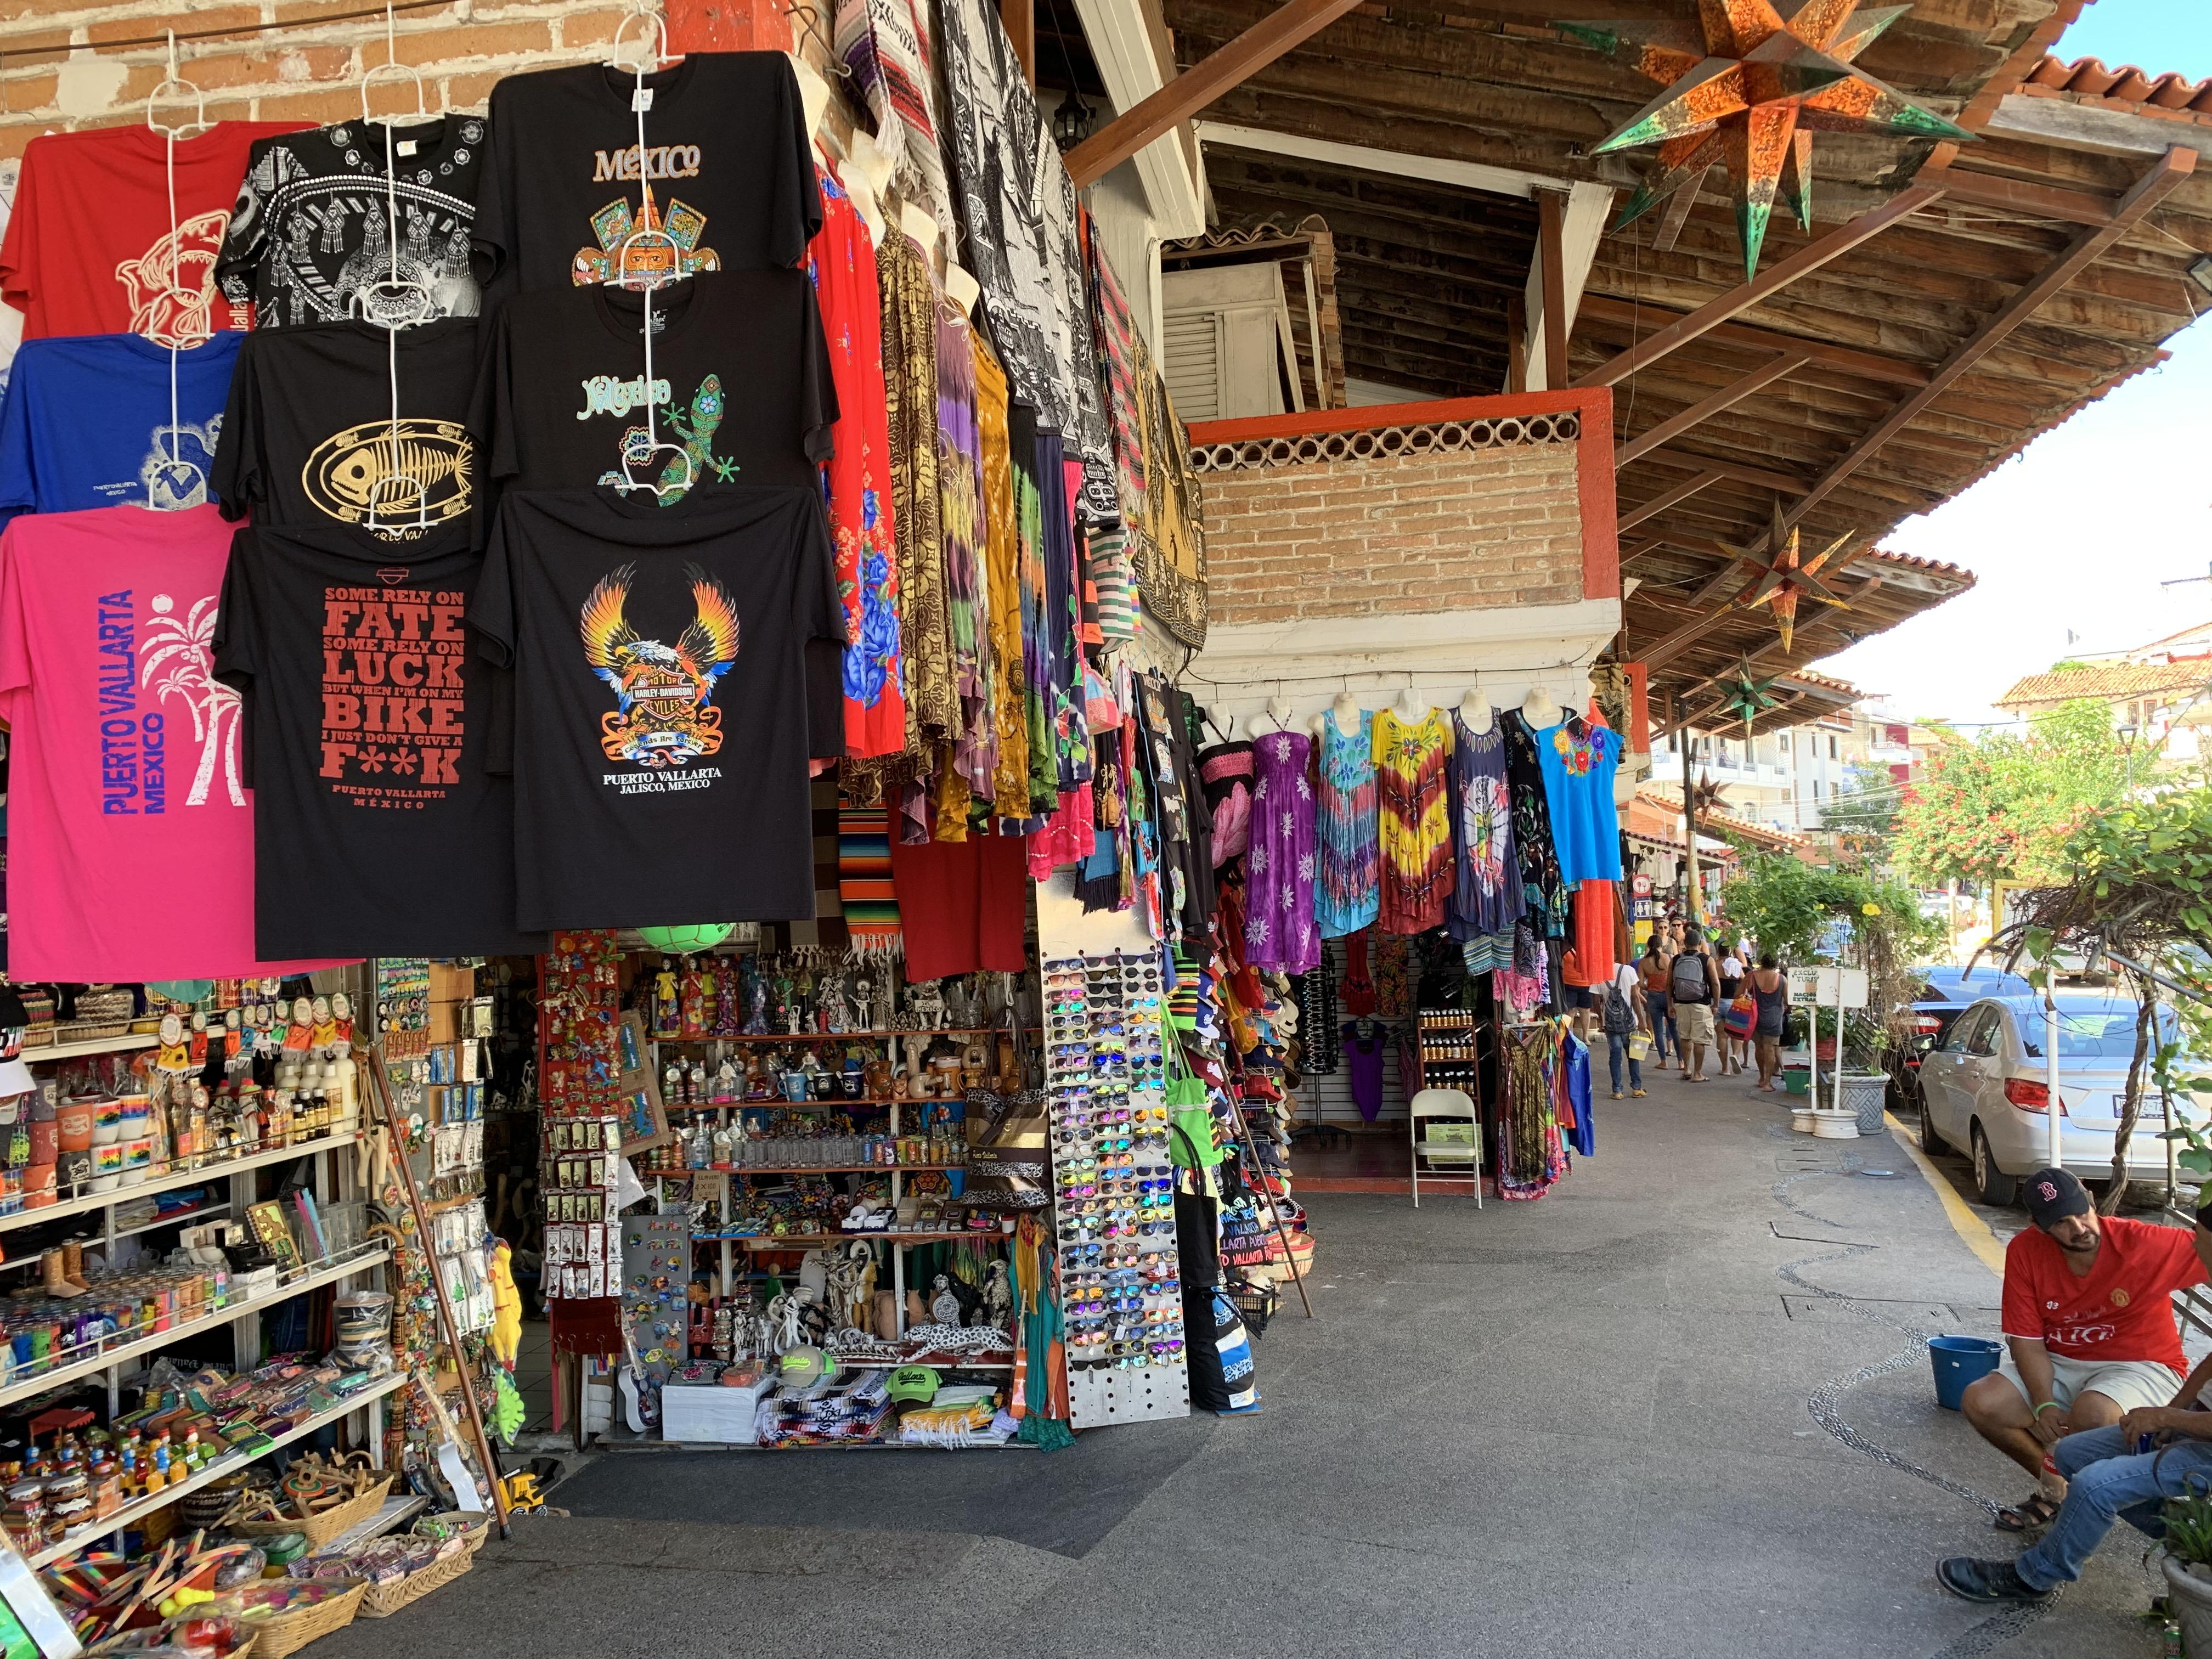 Puerto Vallarta development heats up: Travel Weekly